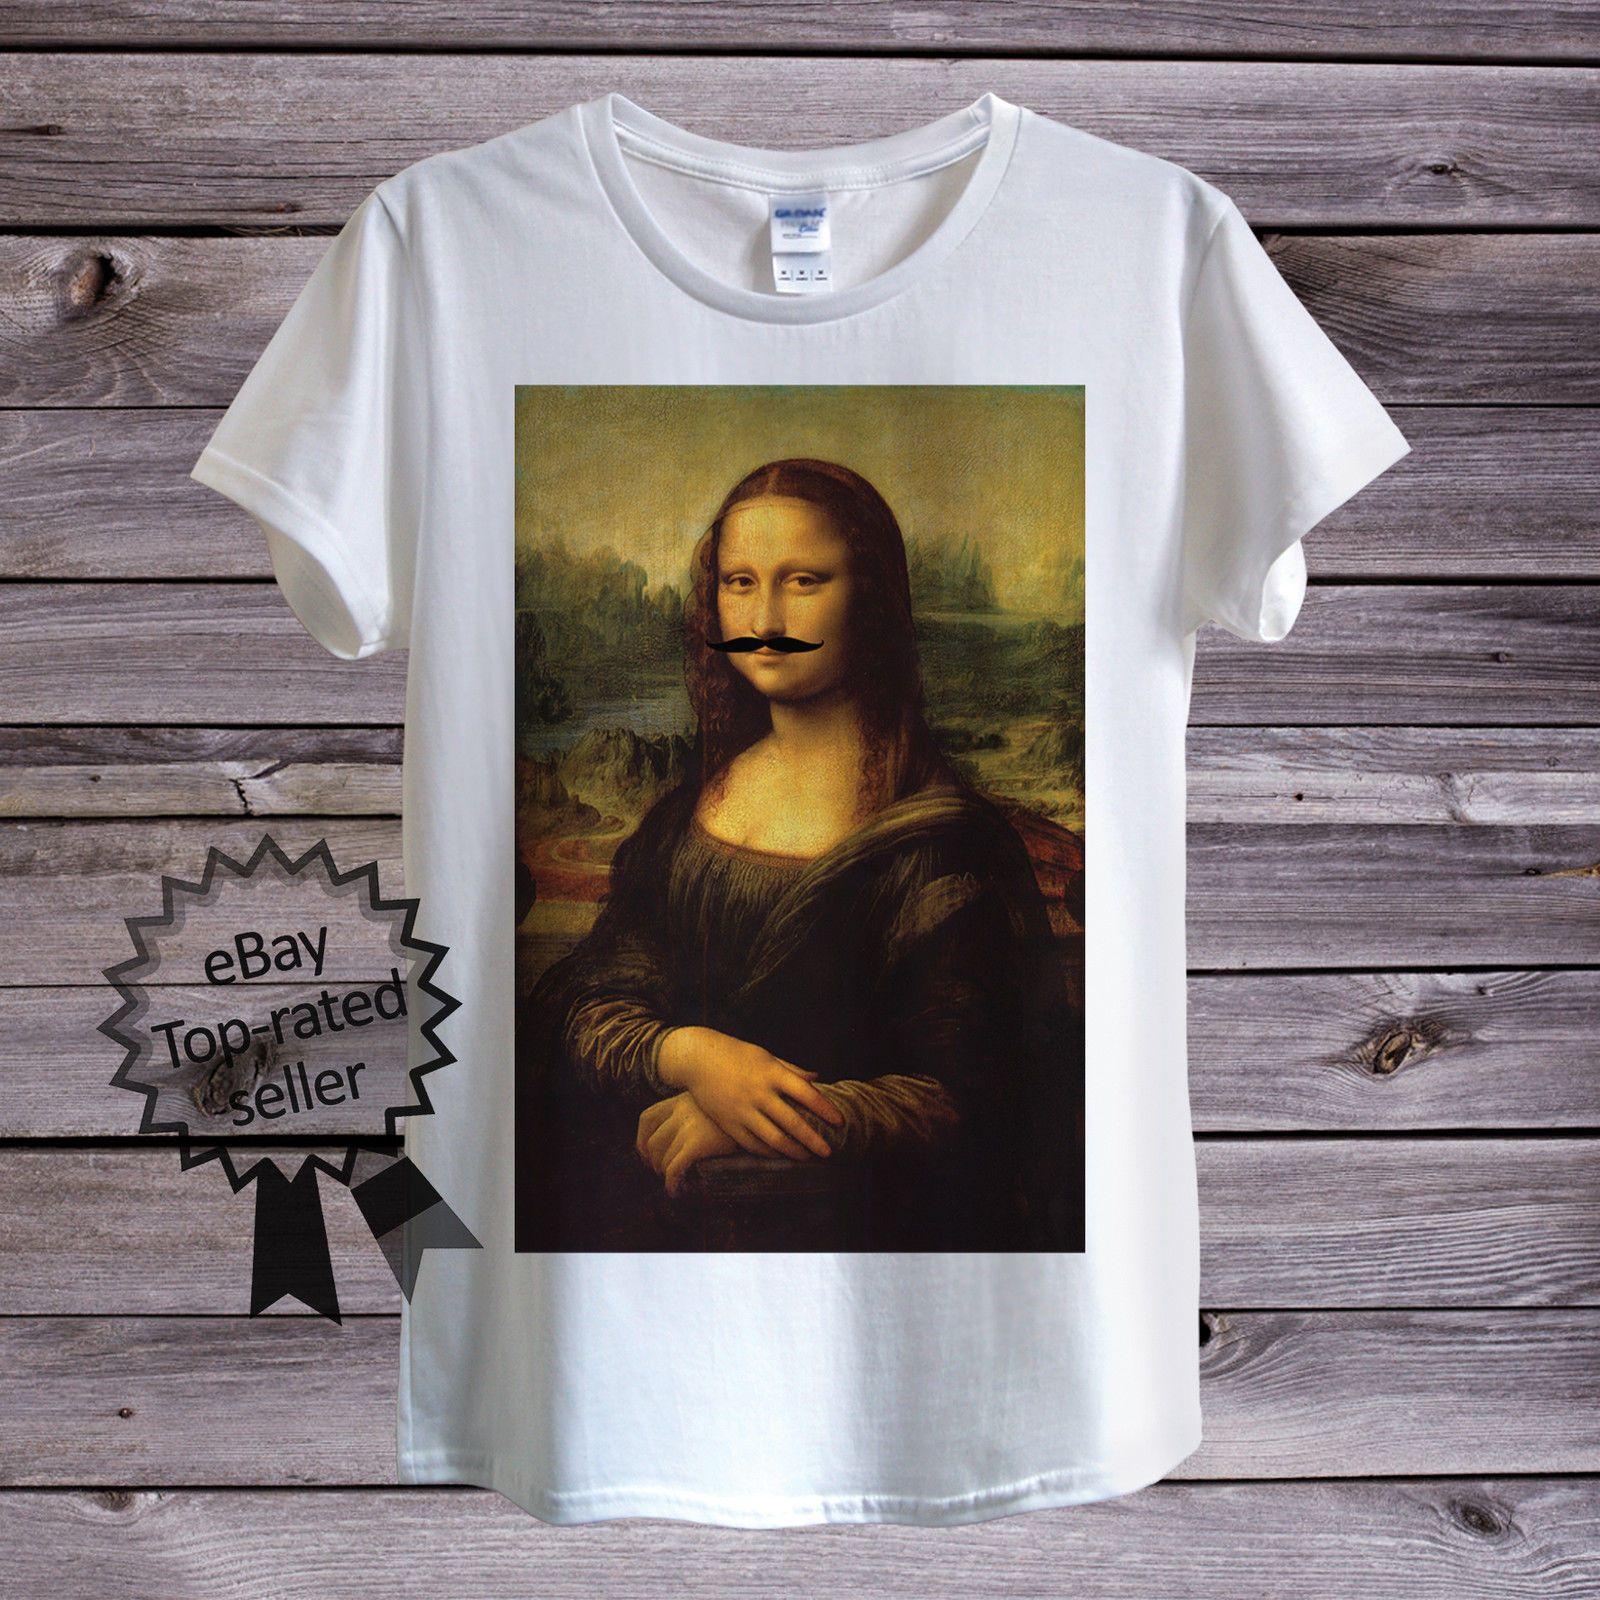 Para Camiseta Vintage Hombre Mujer Vinci UnisexLeonardo Lisa Da O Mona Moustache 8OXknw0P